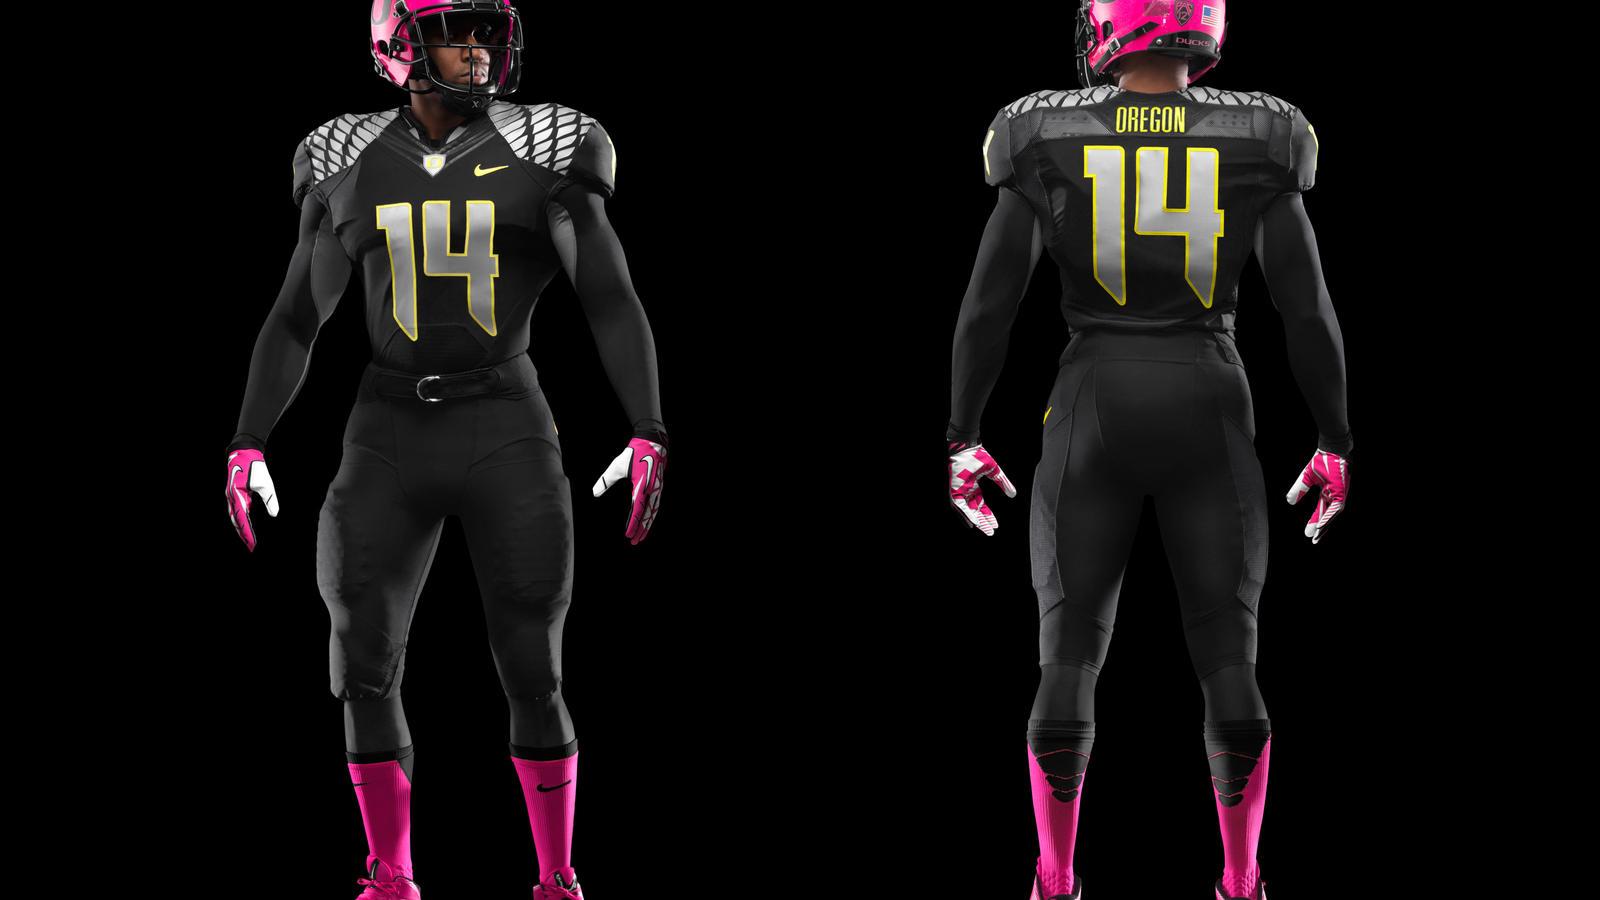 ncaa_fb13_uniforms_oregon_fullbody_2up